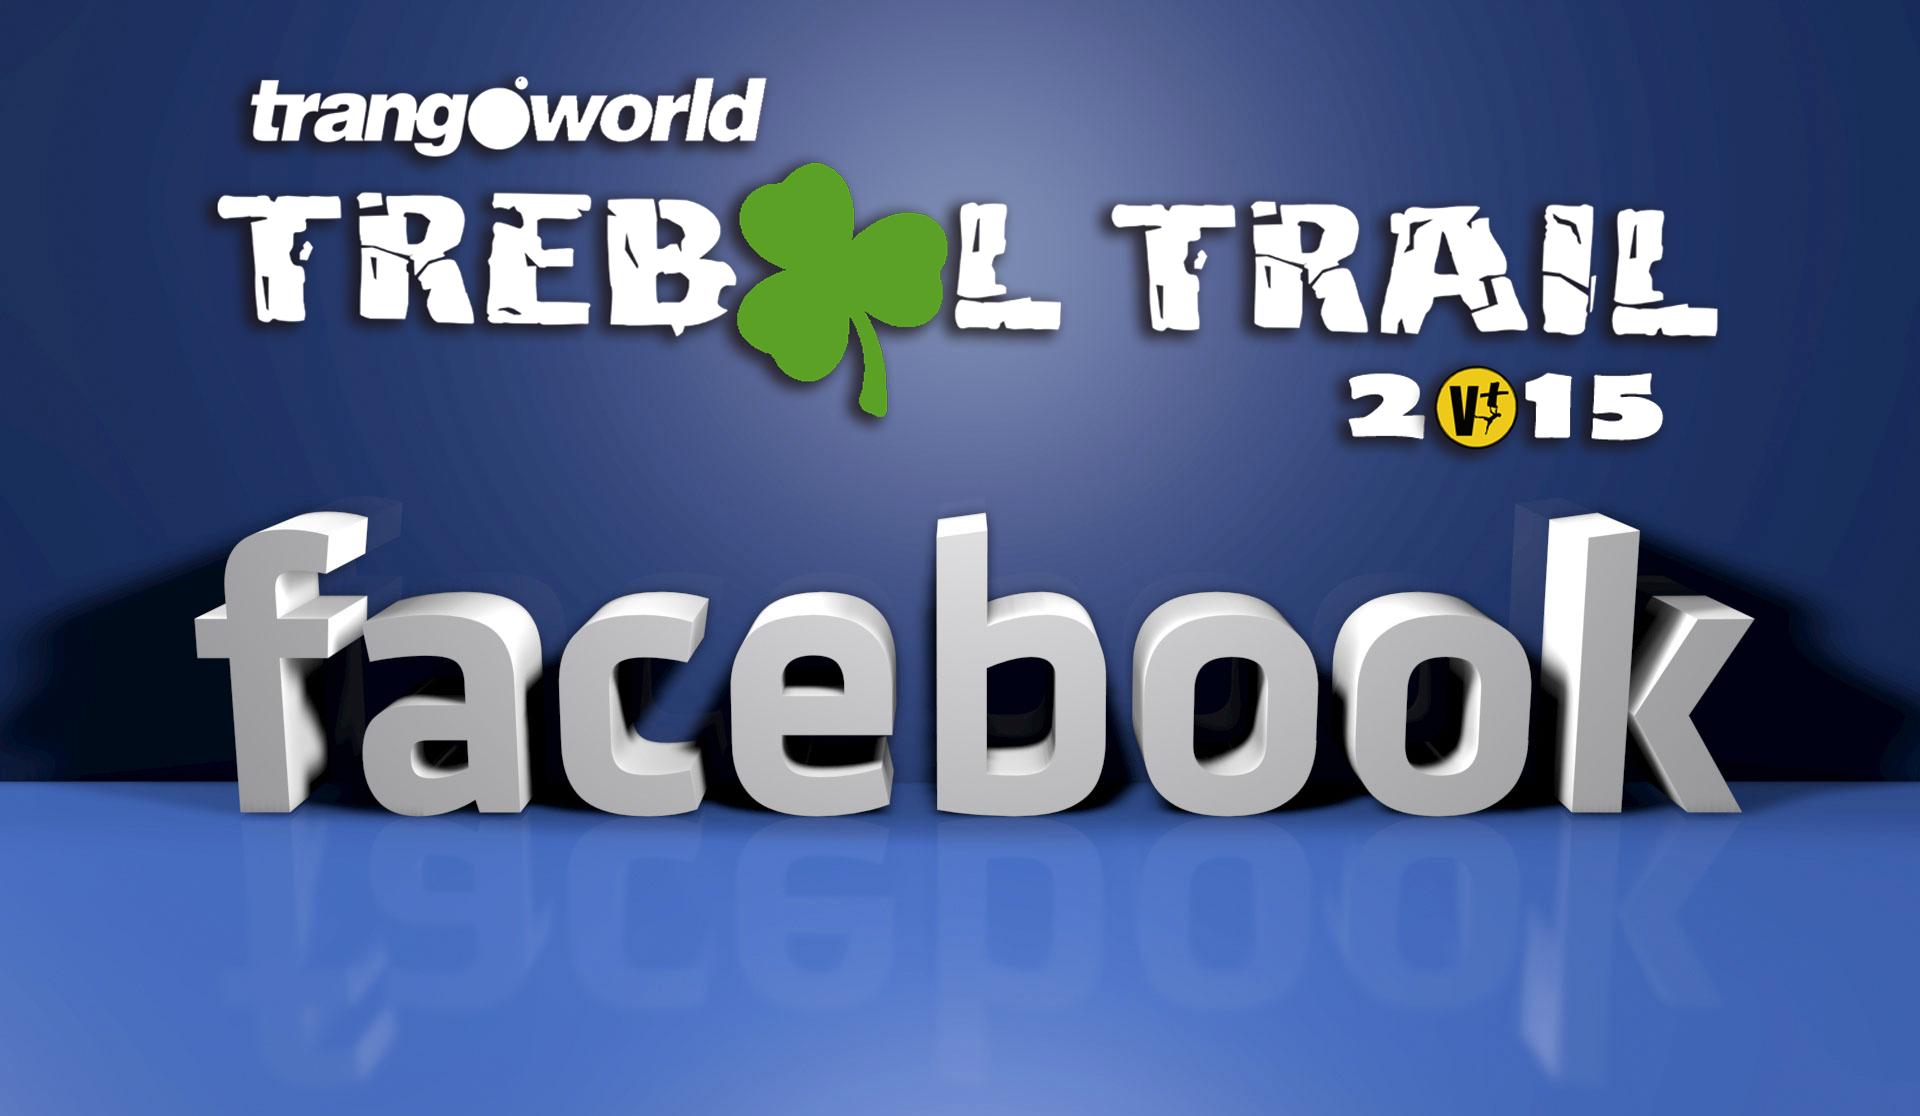 HAZTE FAN de la PÁGINA DE FACEBOOK de TrangoWorld Trébol Trail !!!